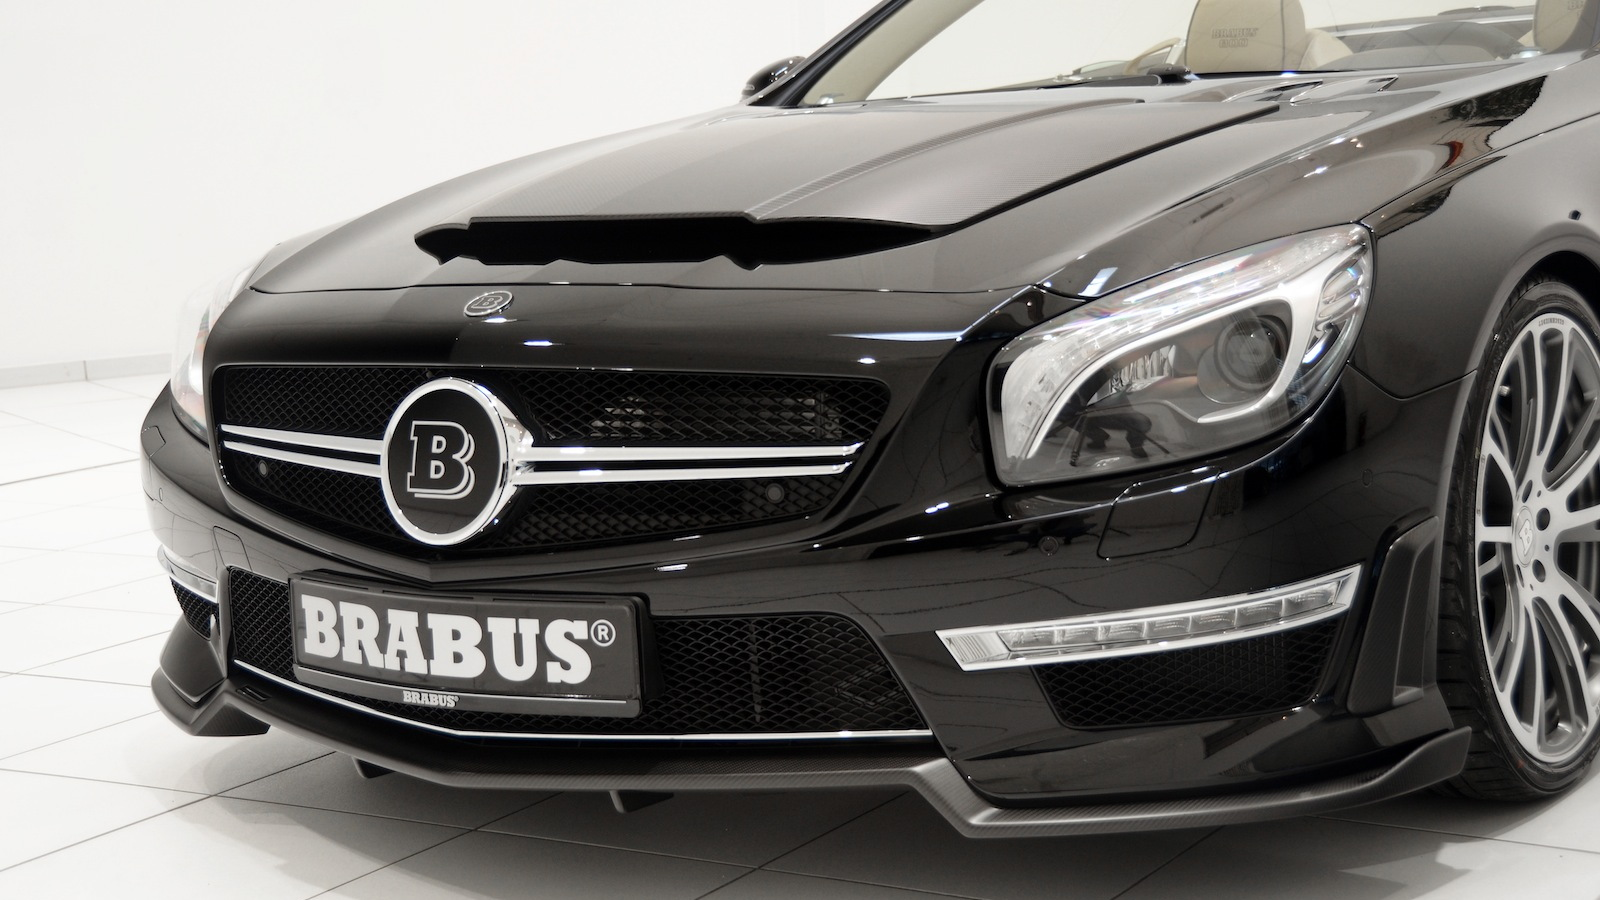 The Brabus 800 Roadster - image: Brabus